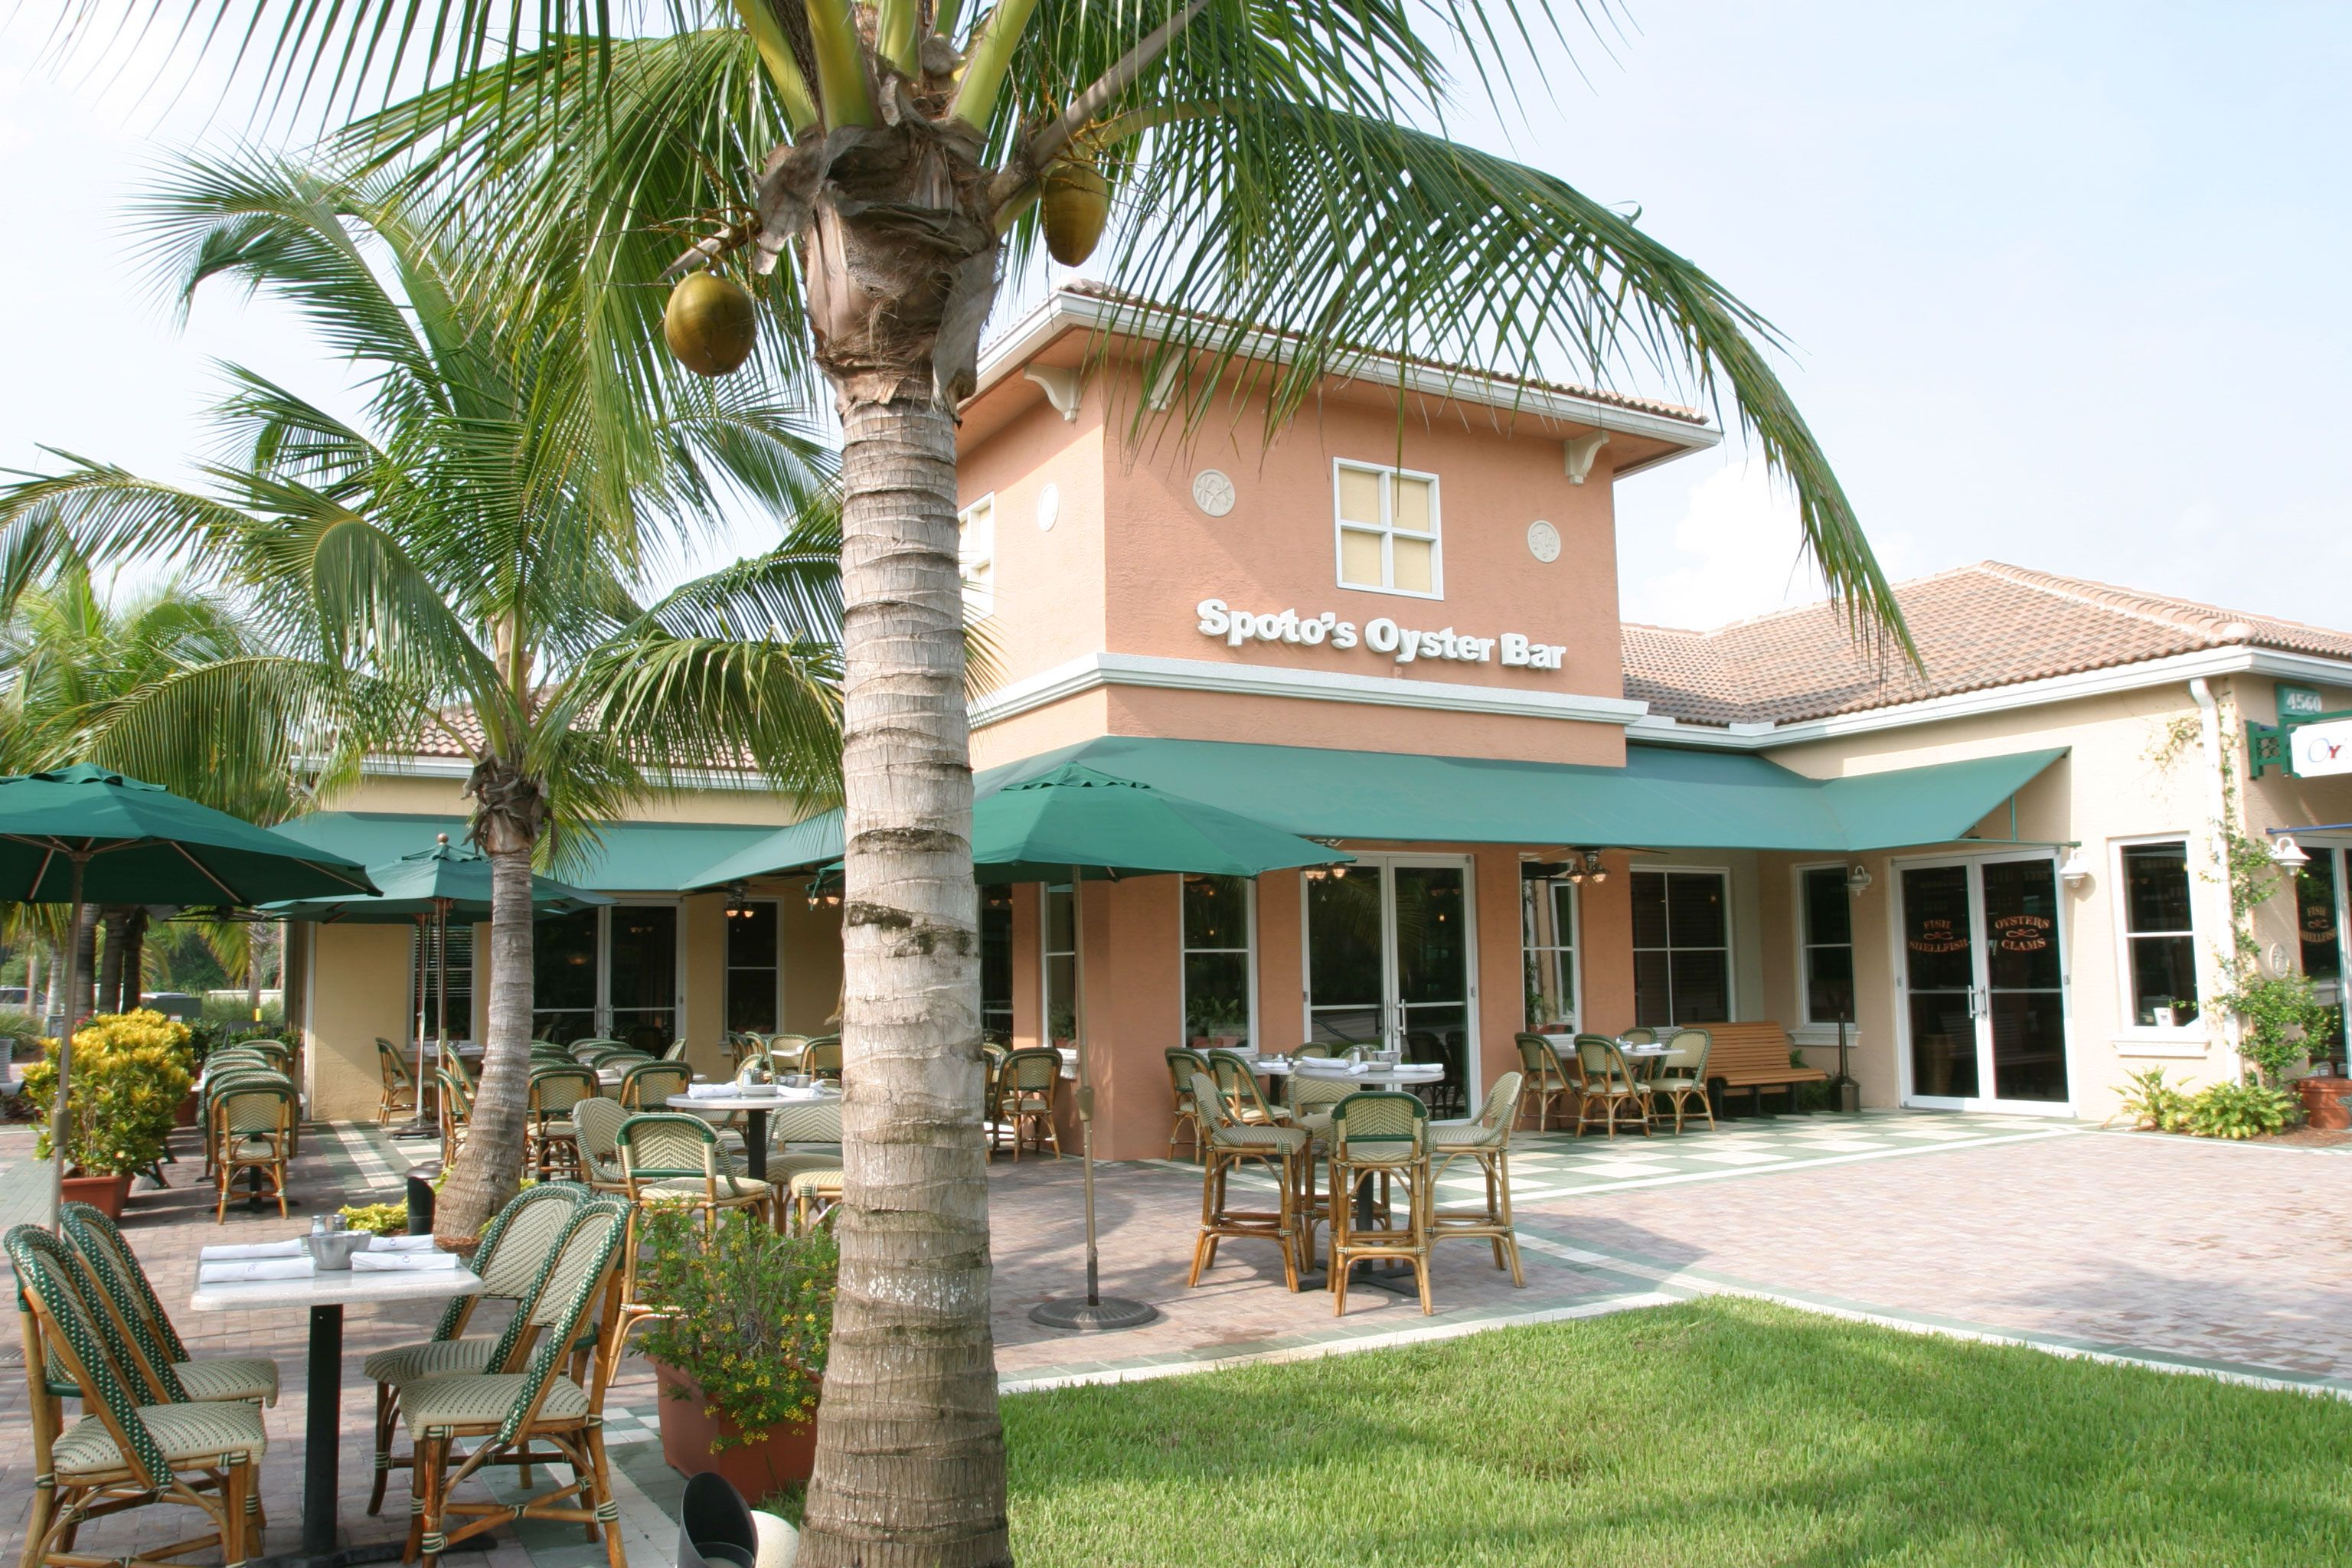 803c0930736df2c7d9051aa3edd8d0fd - Carmines Market In Palm Beach Gardens